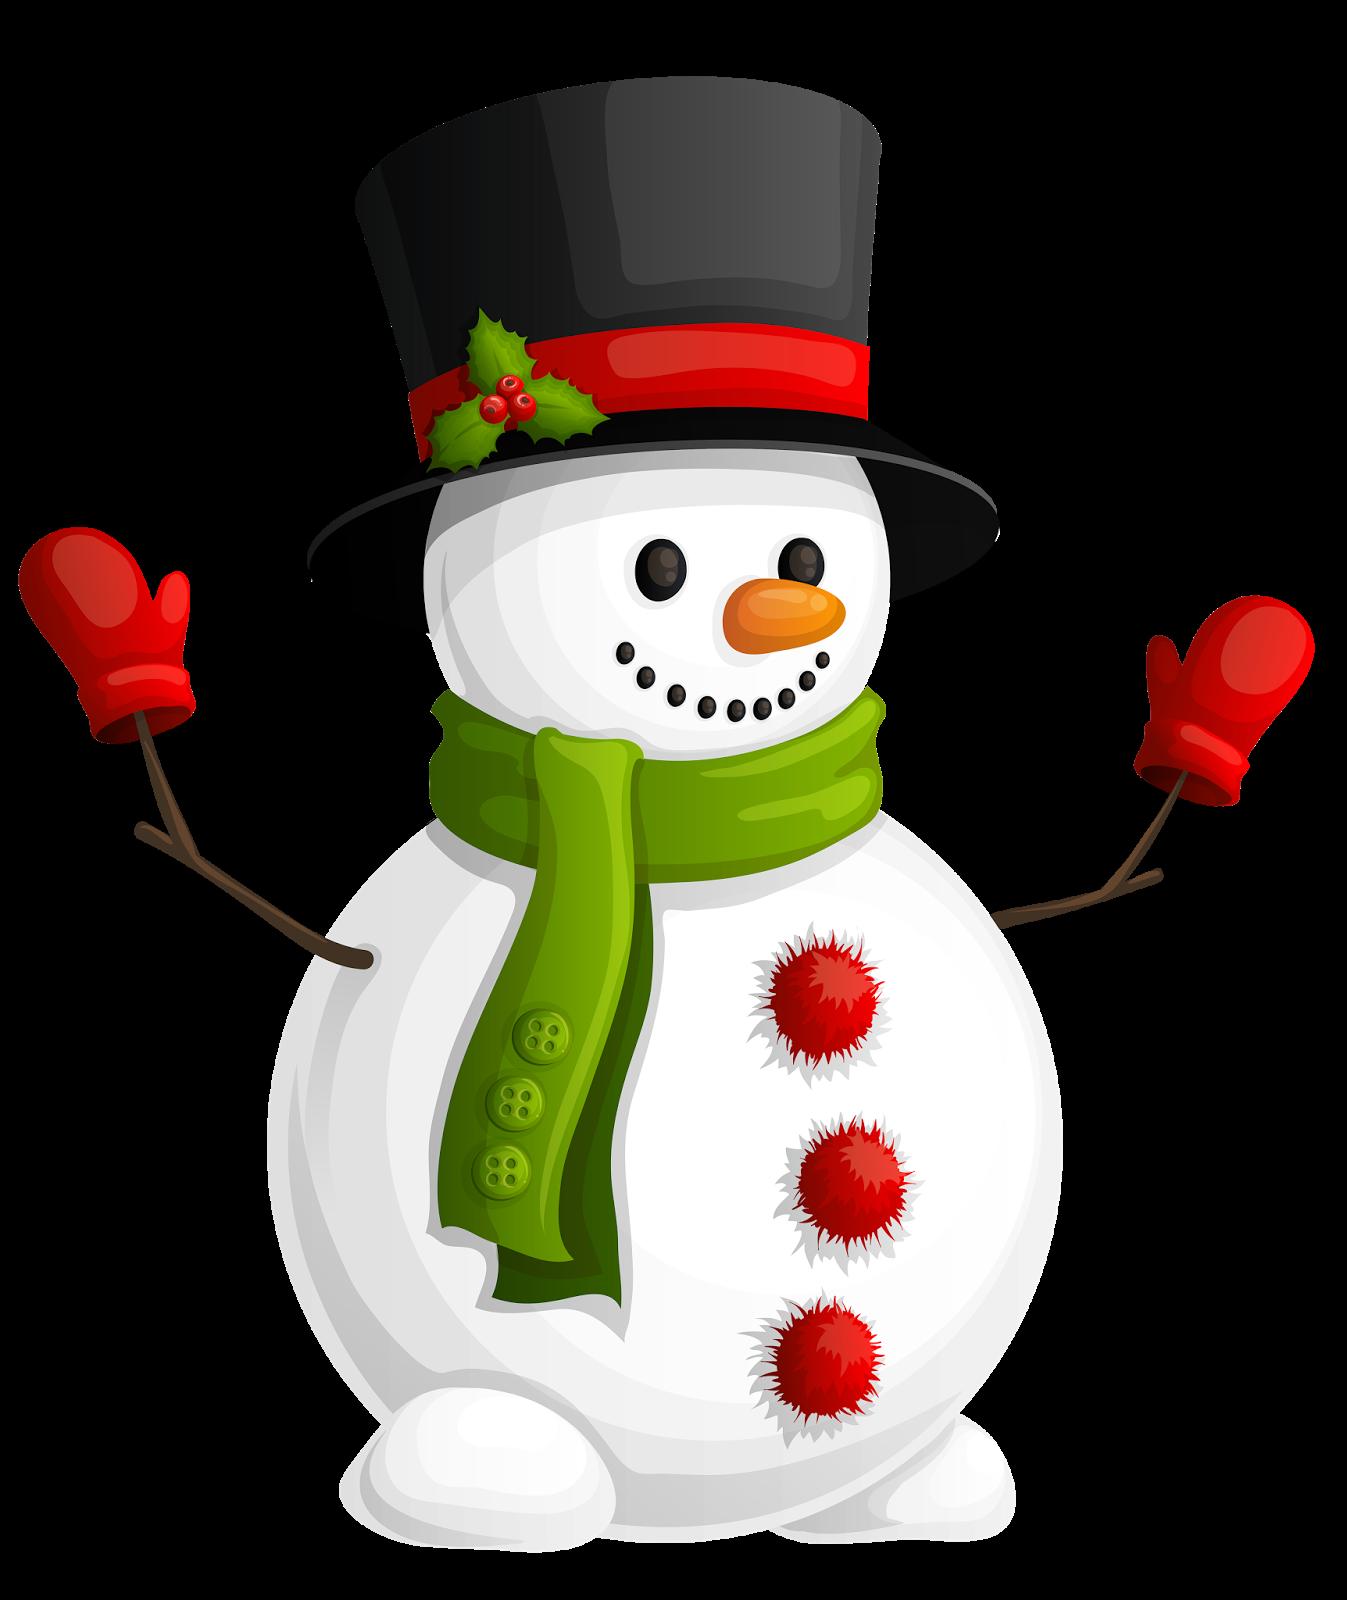 free vector clipart snowman - photo #45